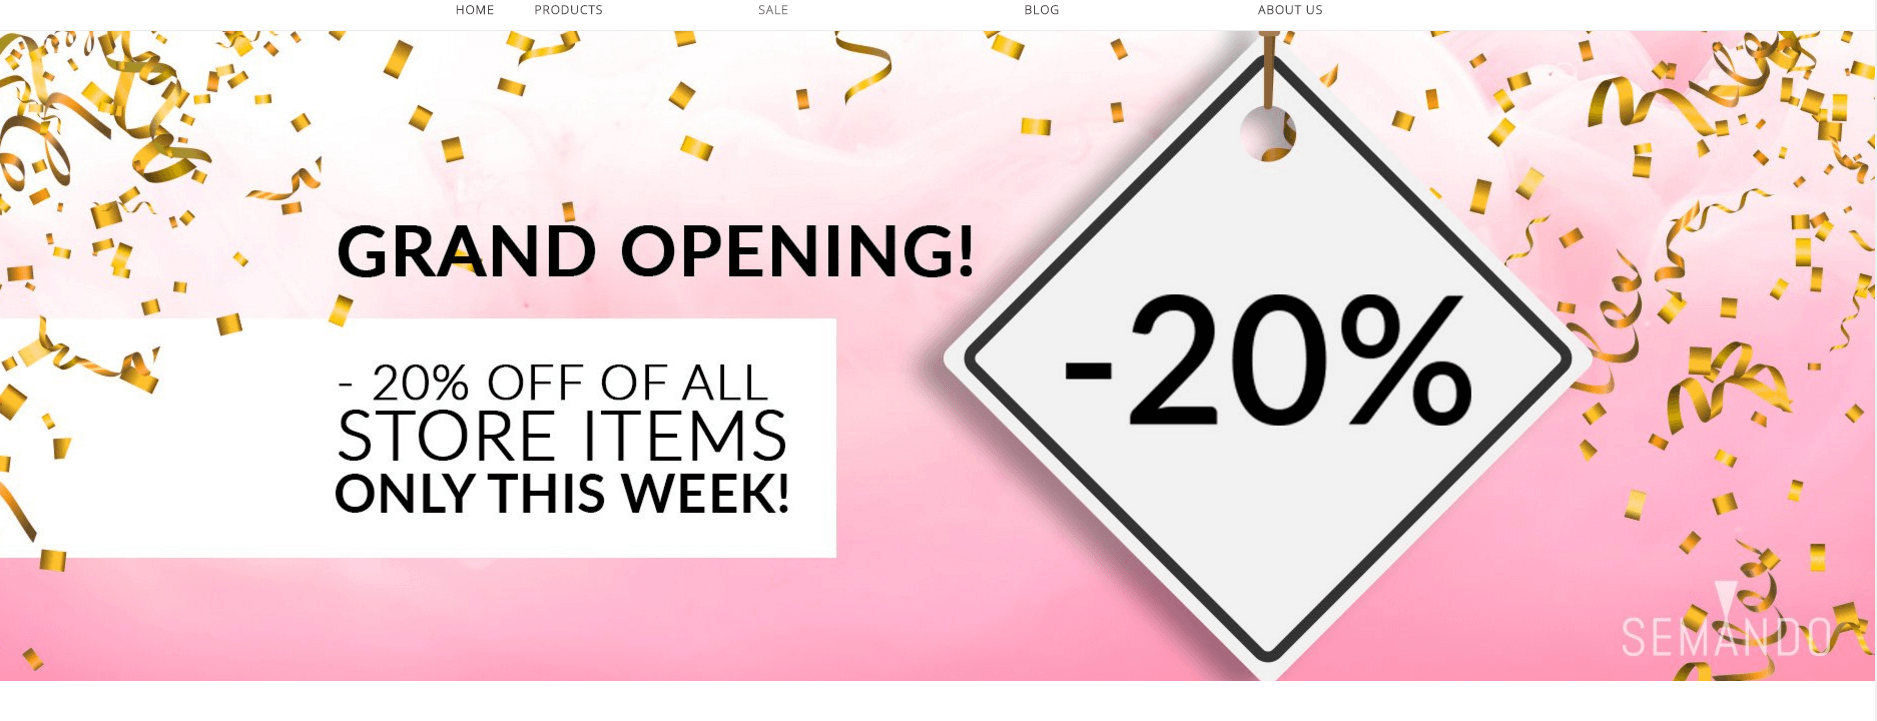 Online store open promo 10